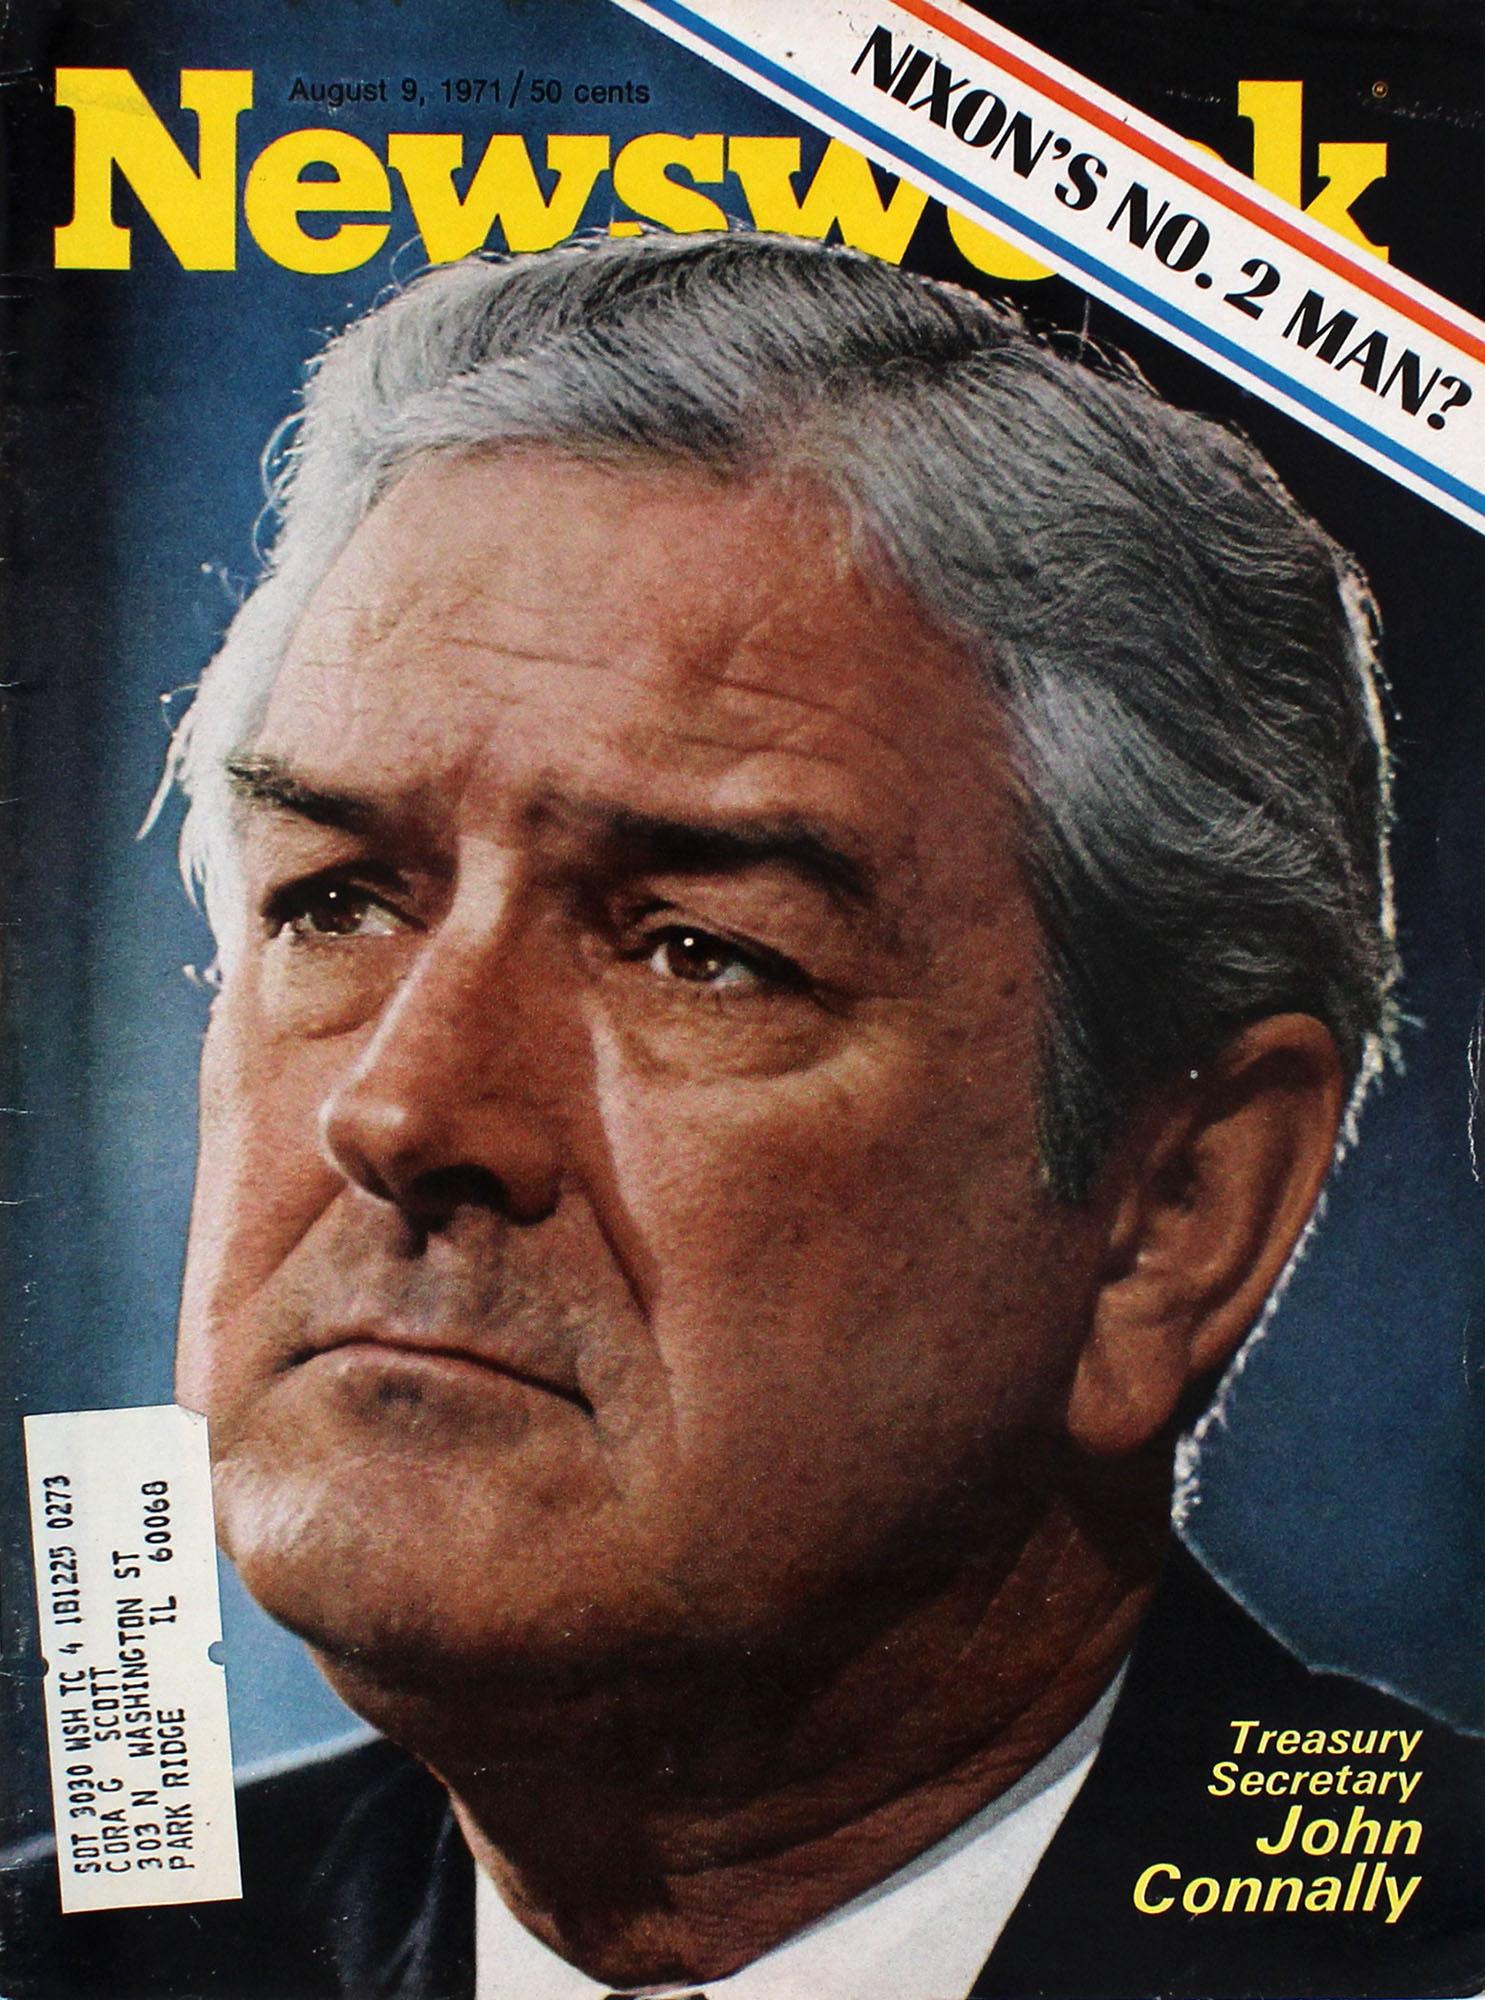 Newsweek Magazine August 9, 1971